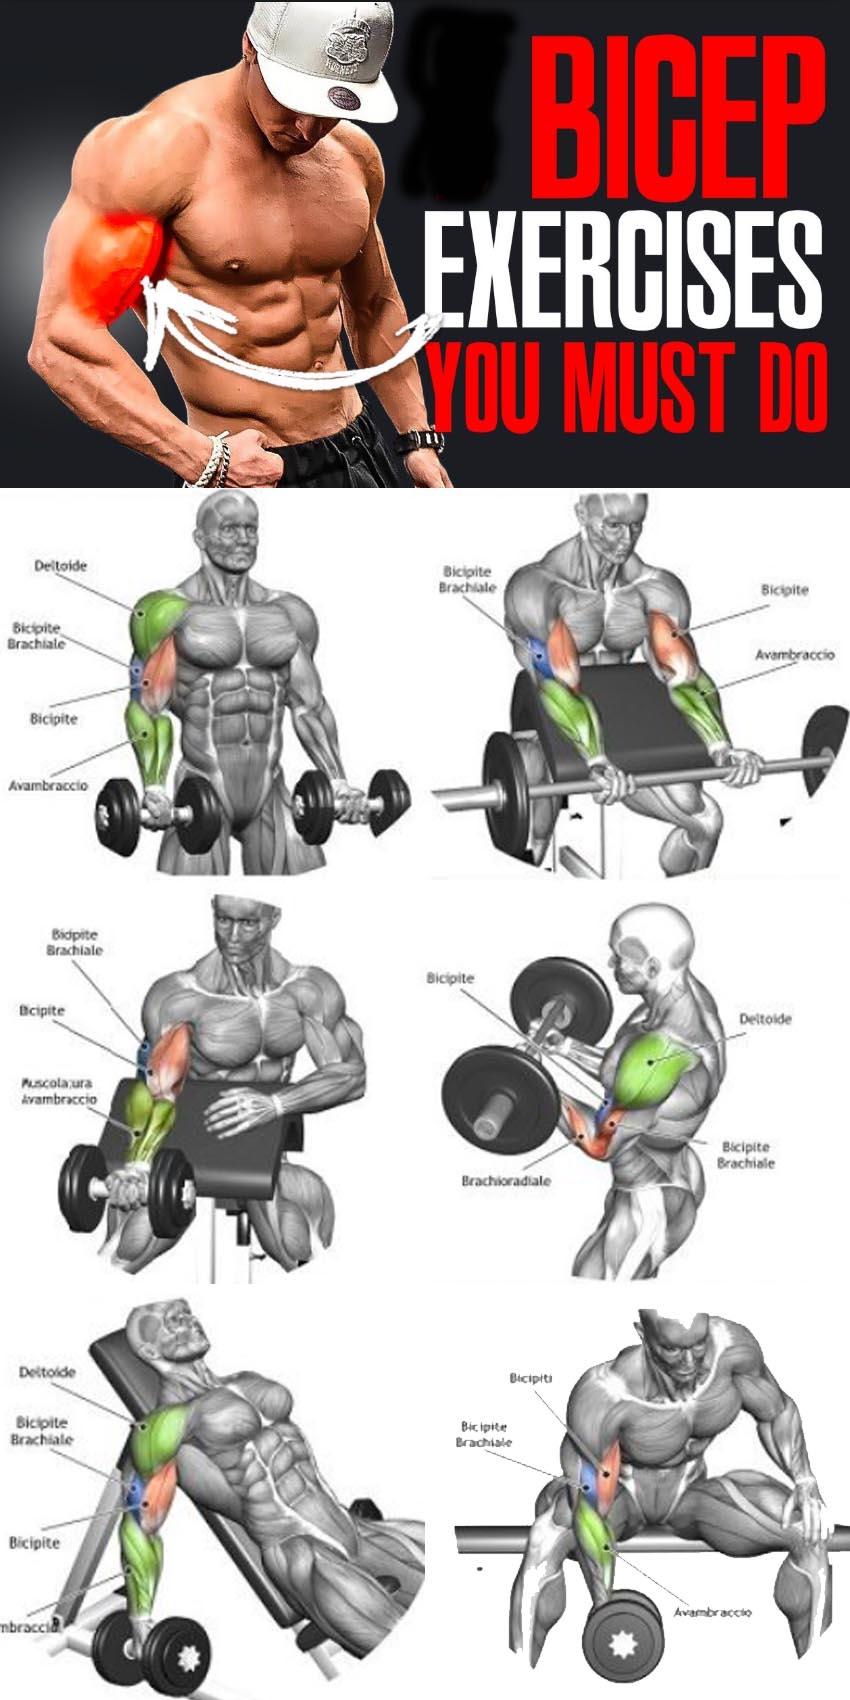 Tutorial Biceps exercises